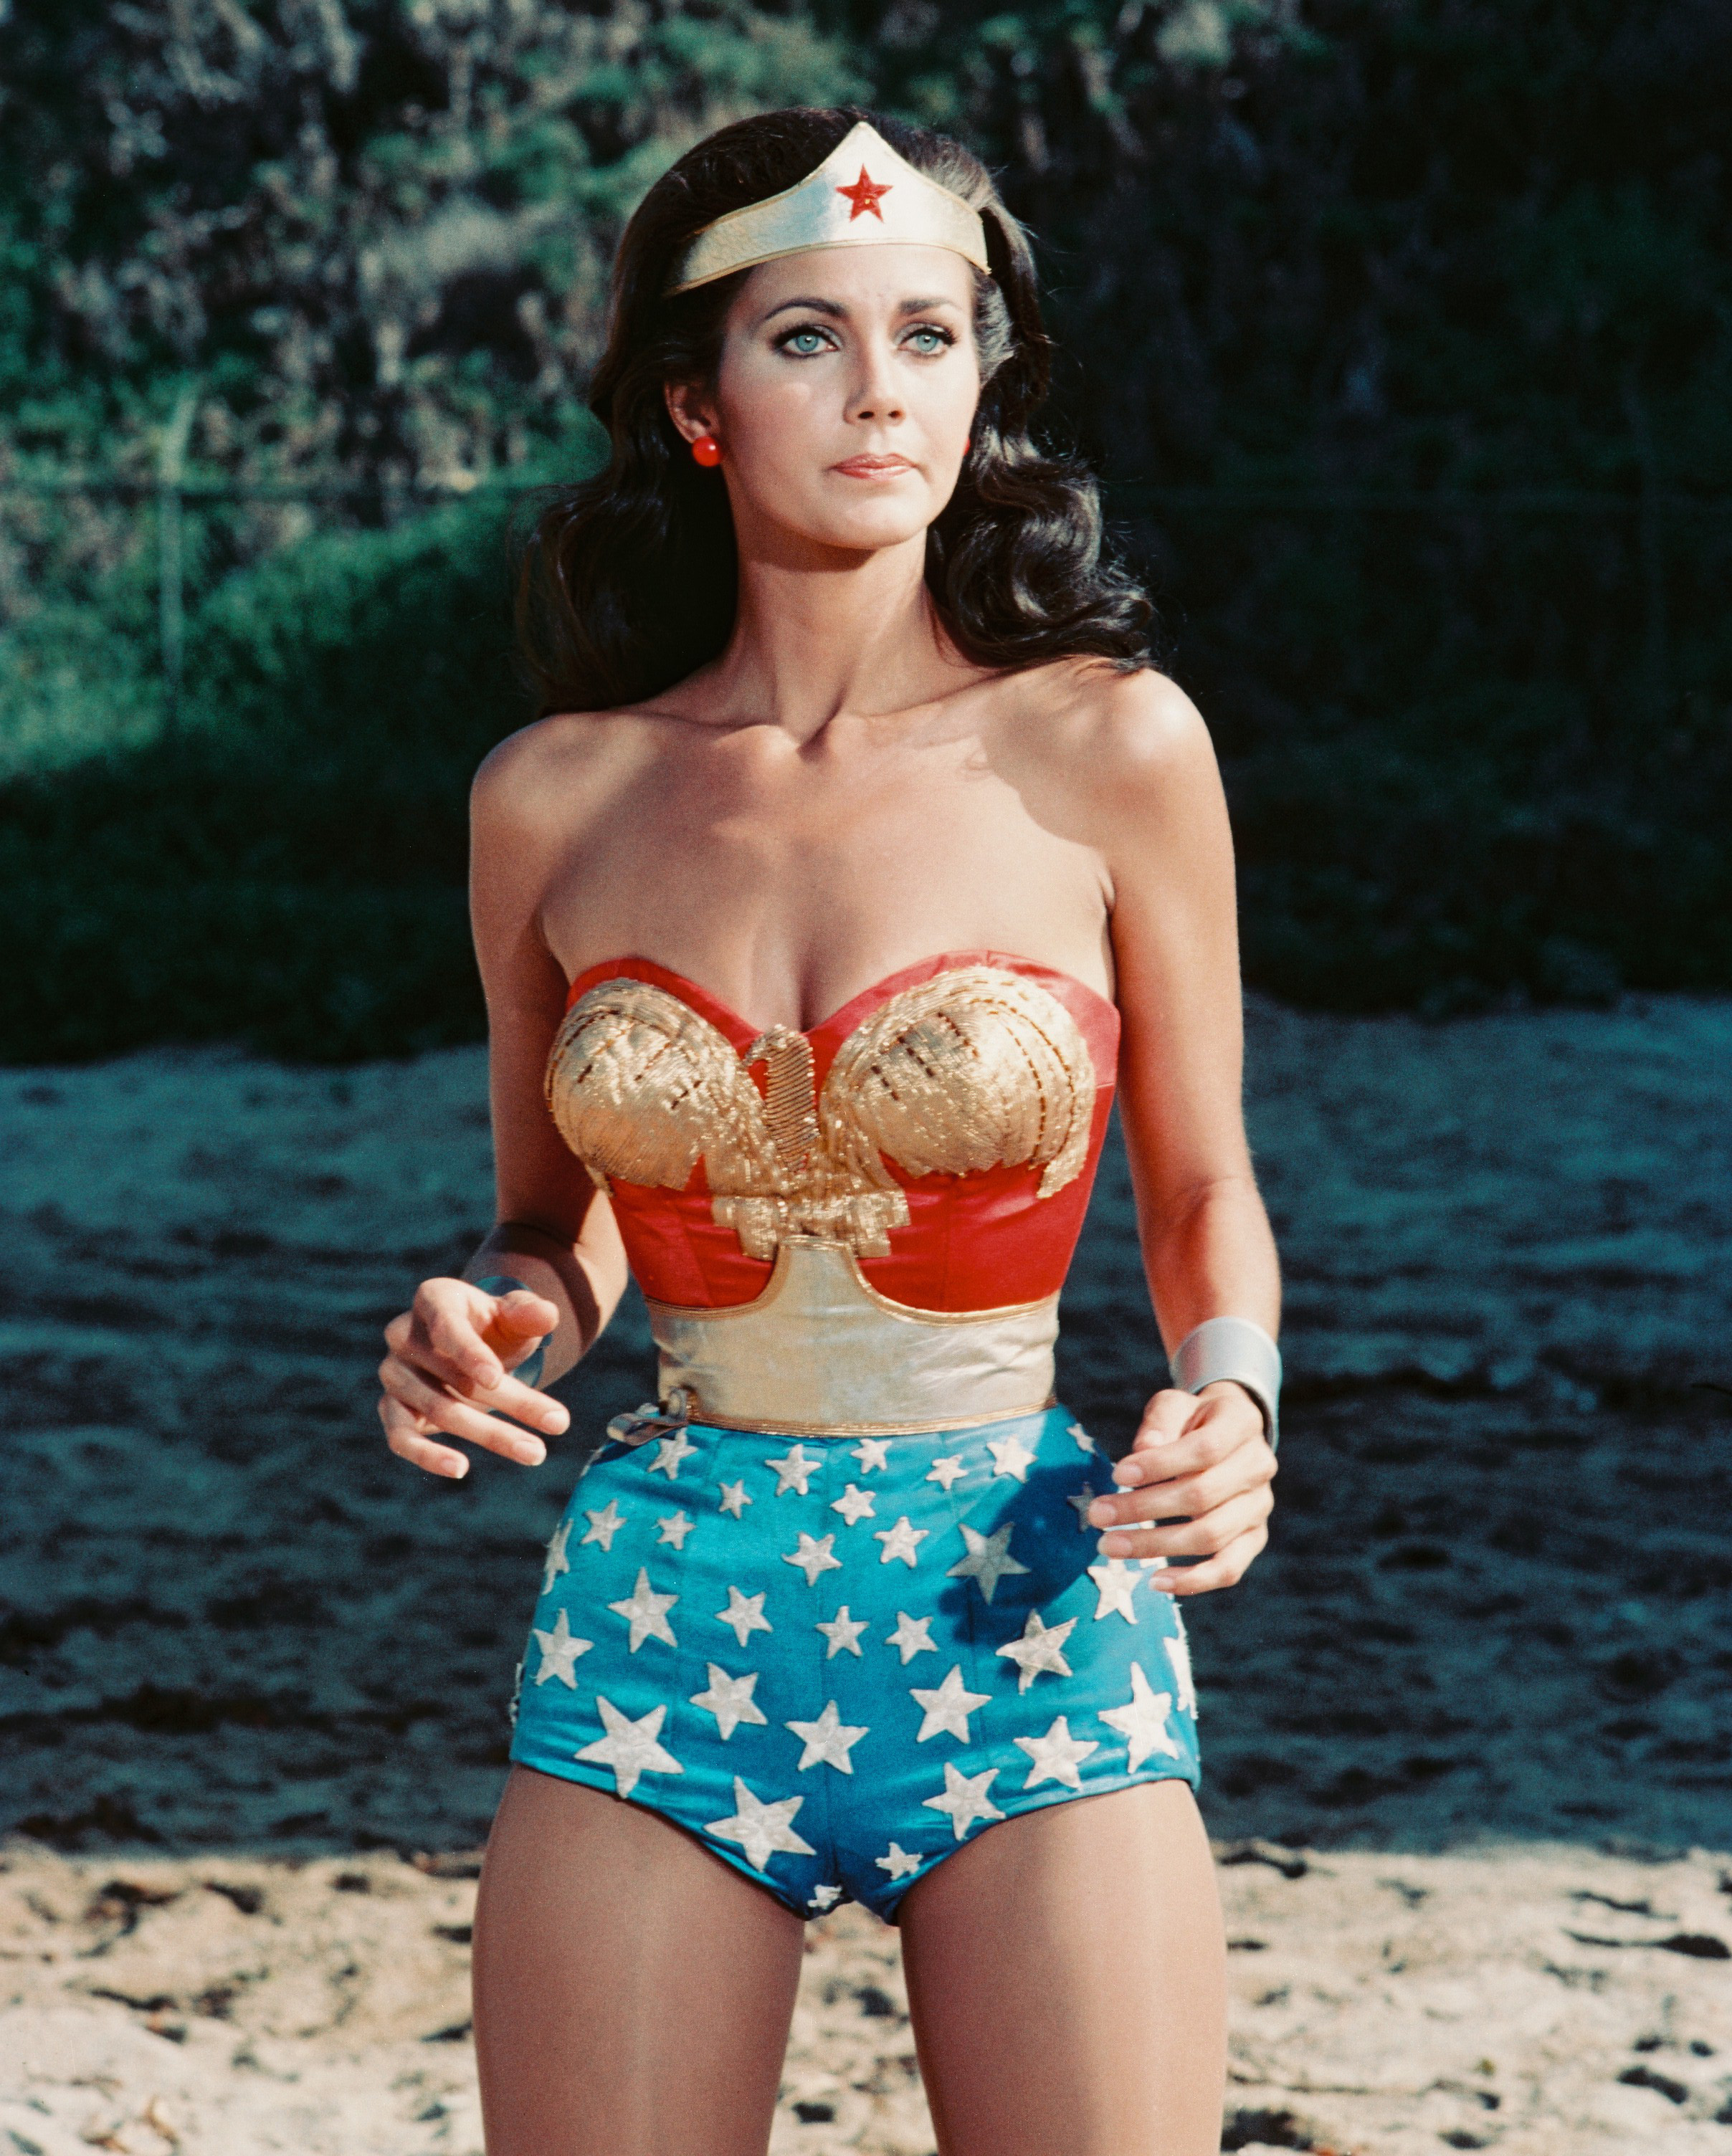 Lynda Carter in a publicity still issue for 'Wonder Woman', circa 1977